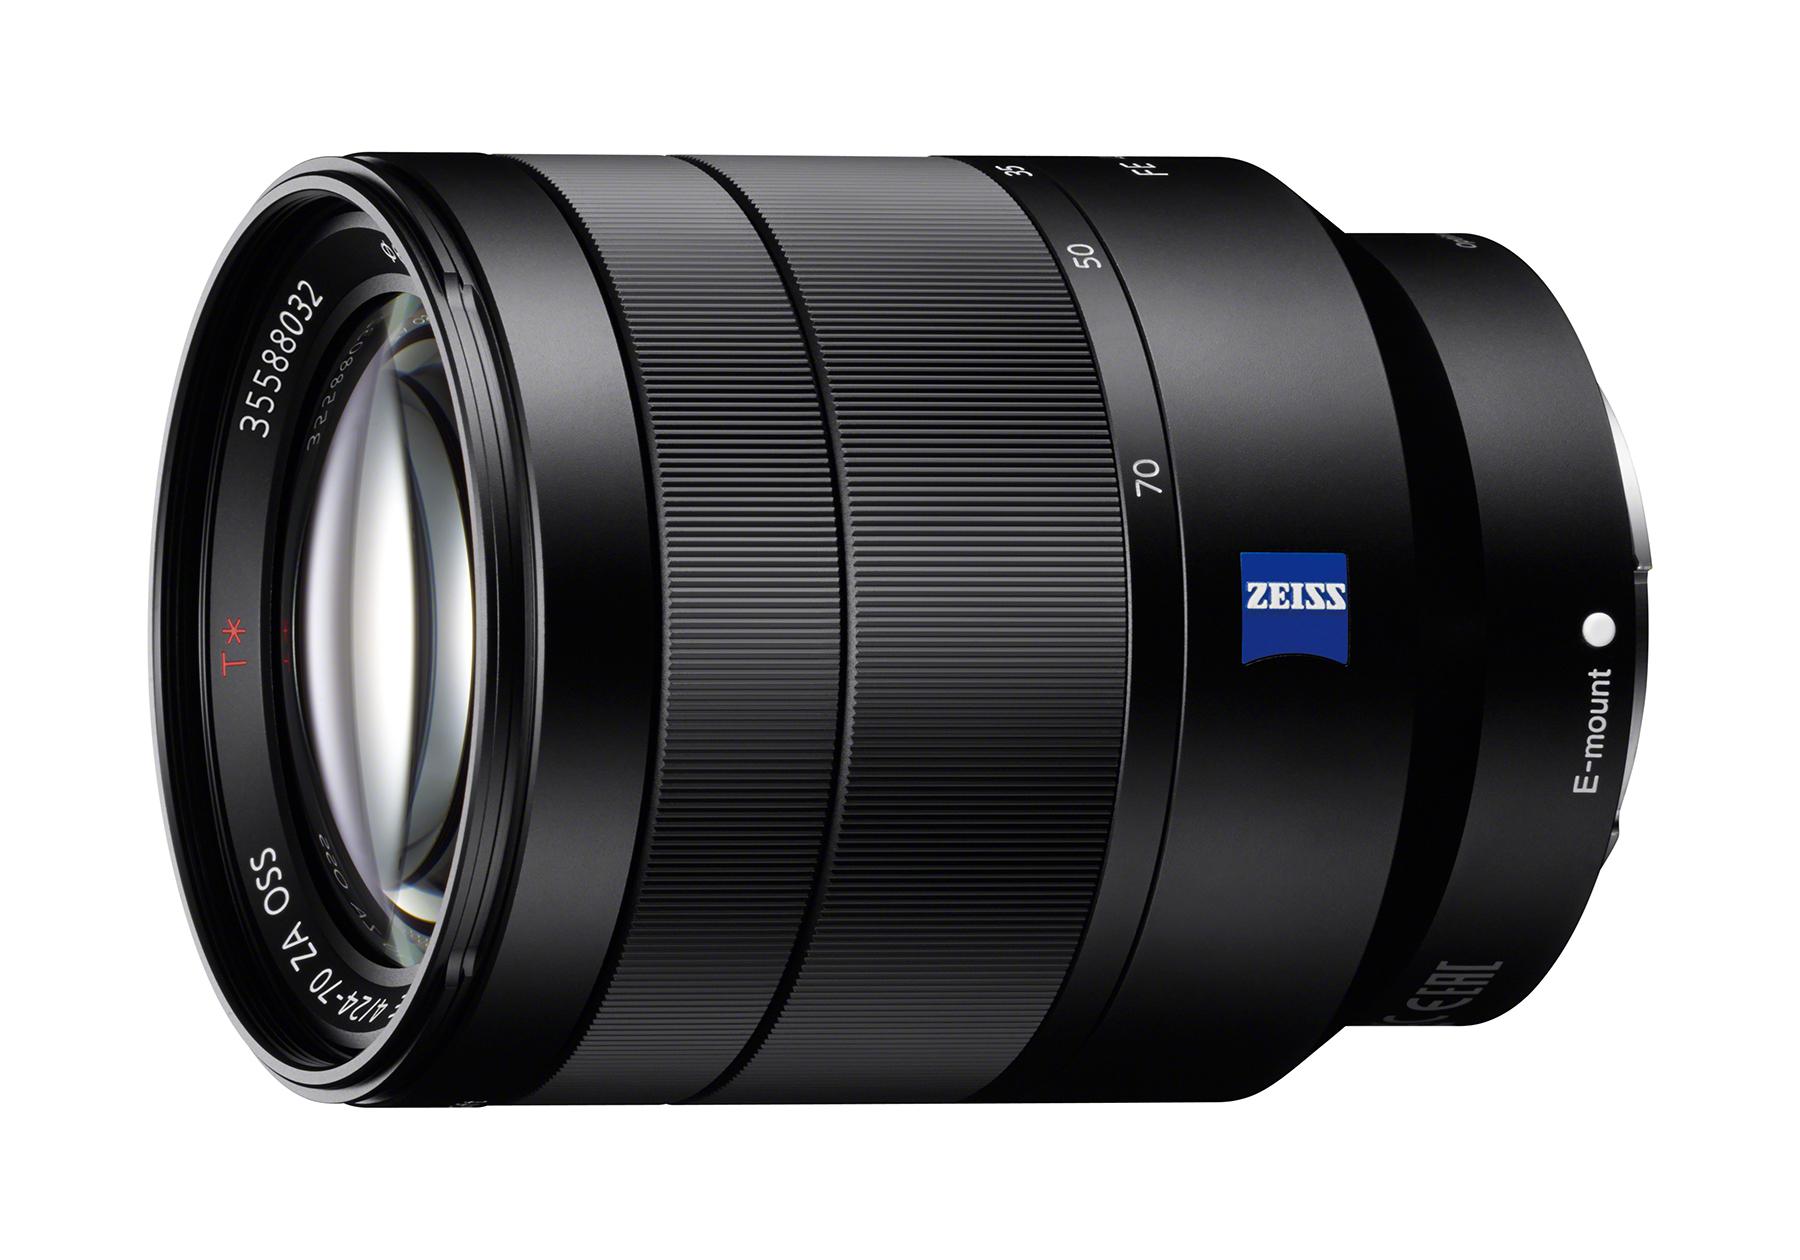 SEL-2470Z объектив Sony Carl Zeiss Vario-Tessar T* 24-70mm f/4 ZA OSS